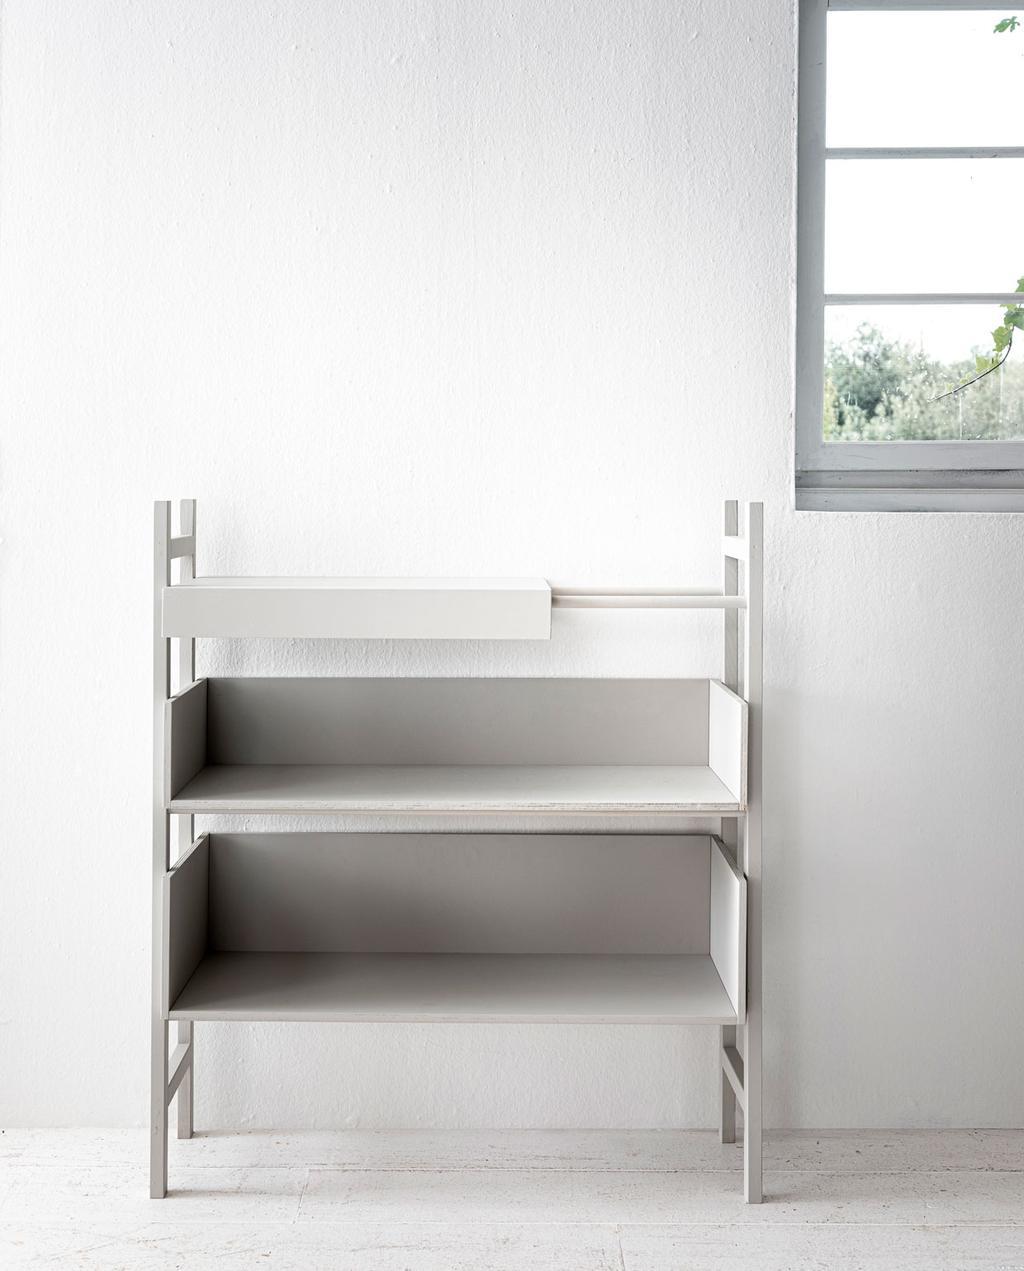 vtwonen 12-2019 | DIY flexibel kastje stap 4